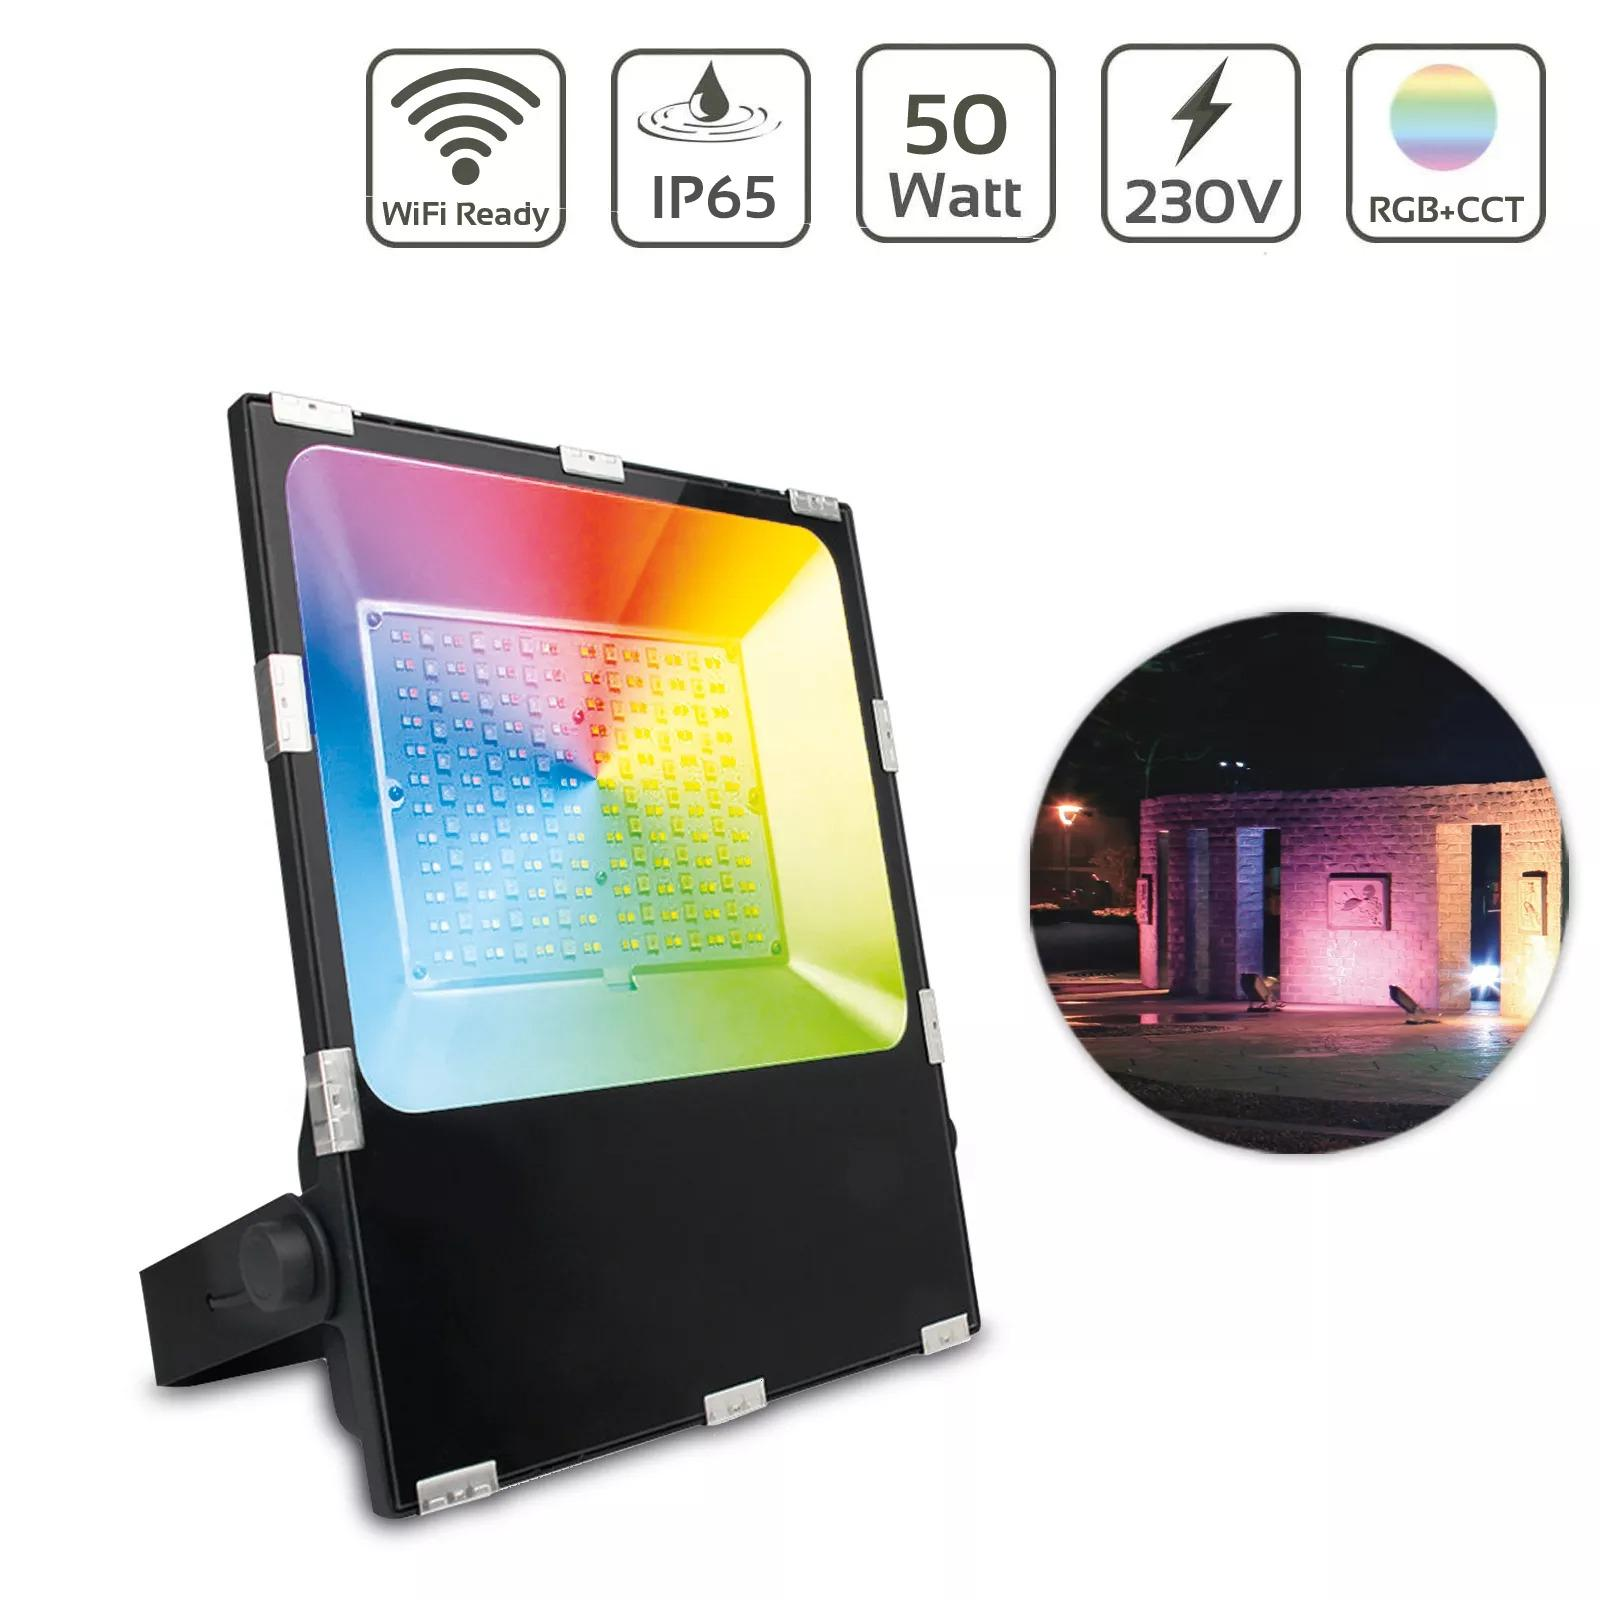 MiBoxer 50W RGB+CCT LED Außenstrahler WiFi Farbwechsel Fluter FUTT02